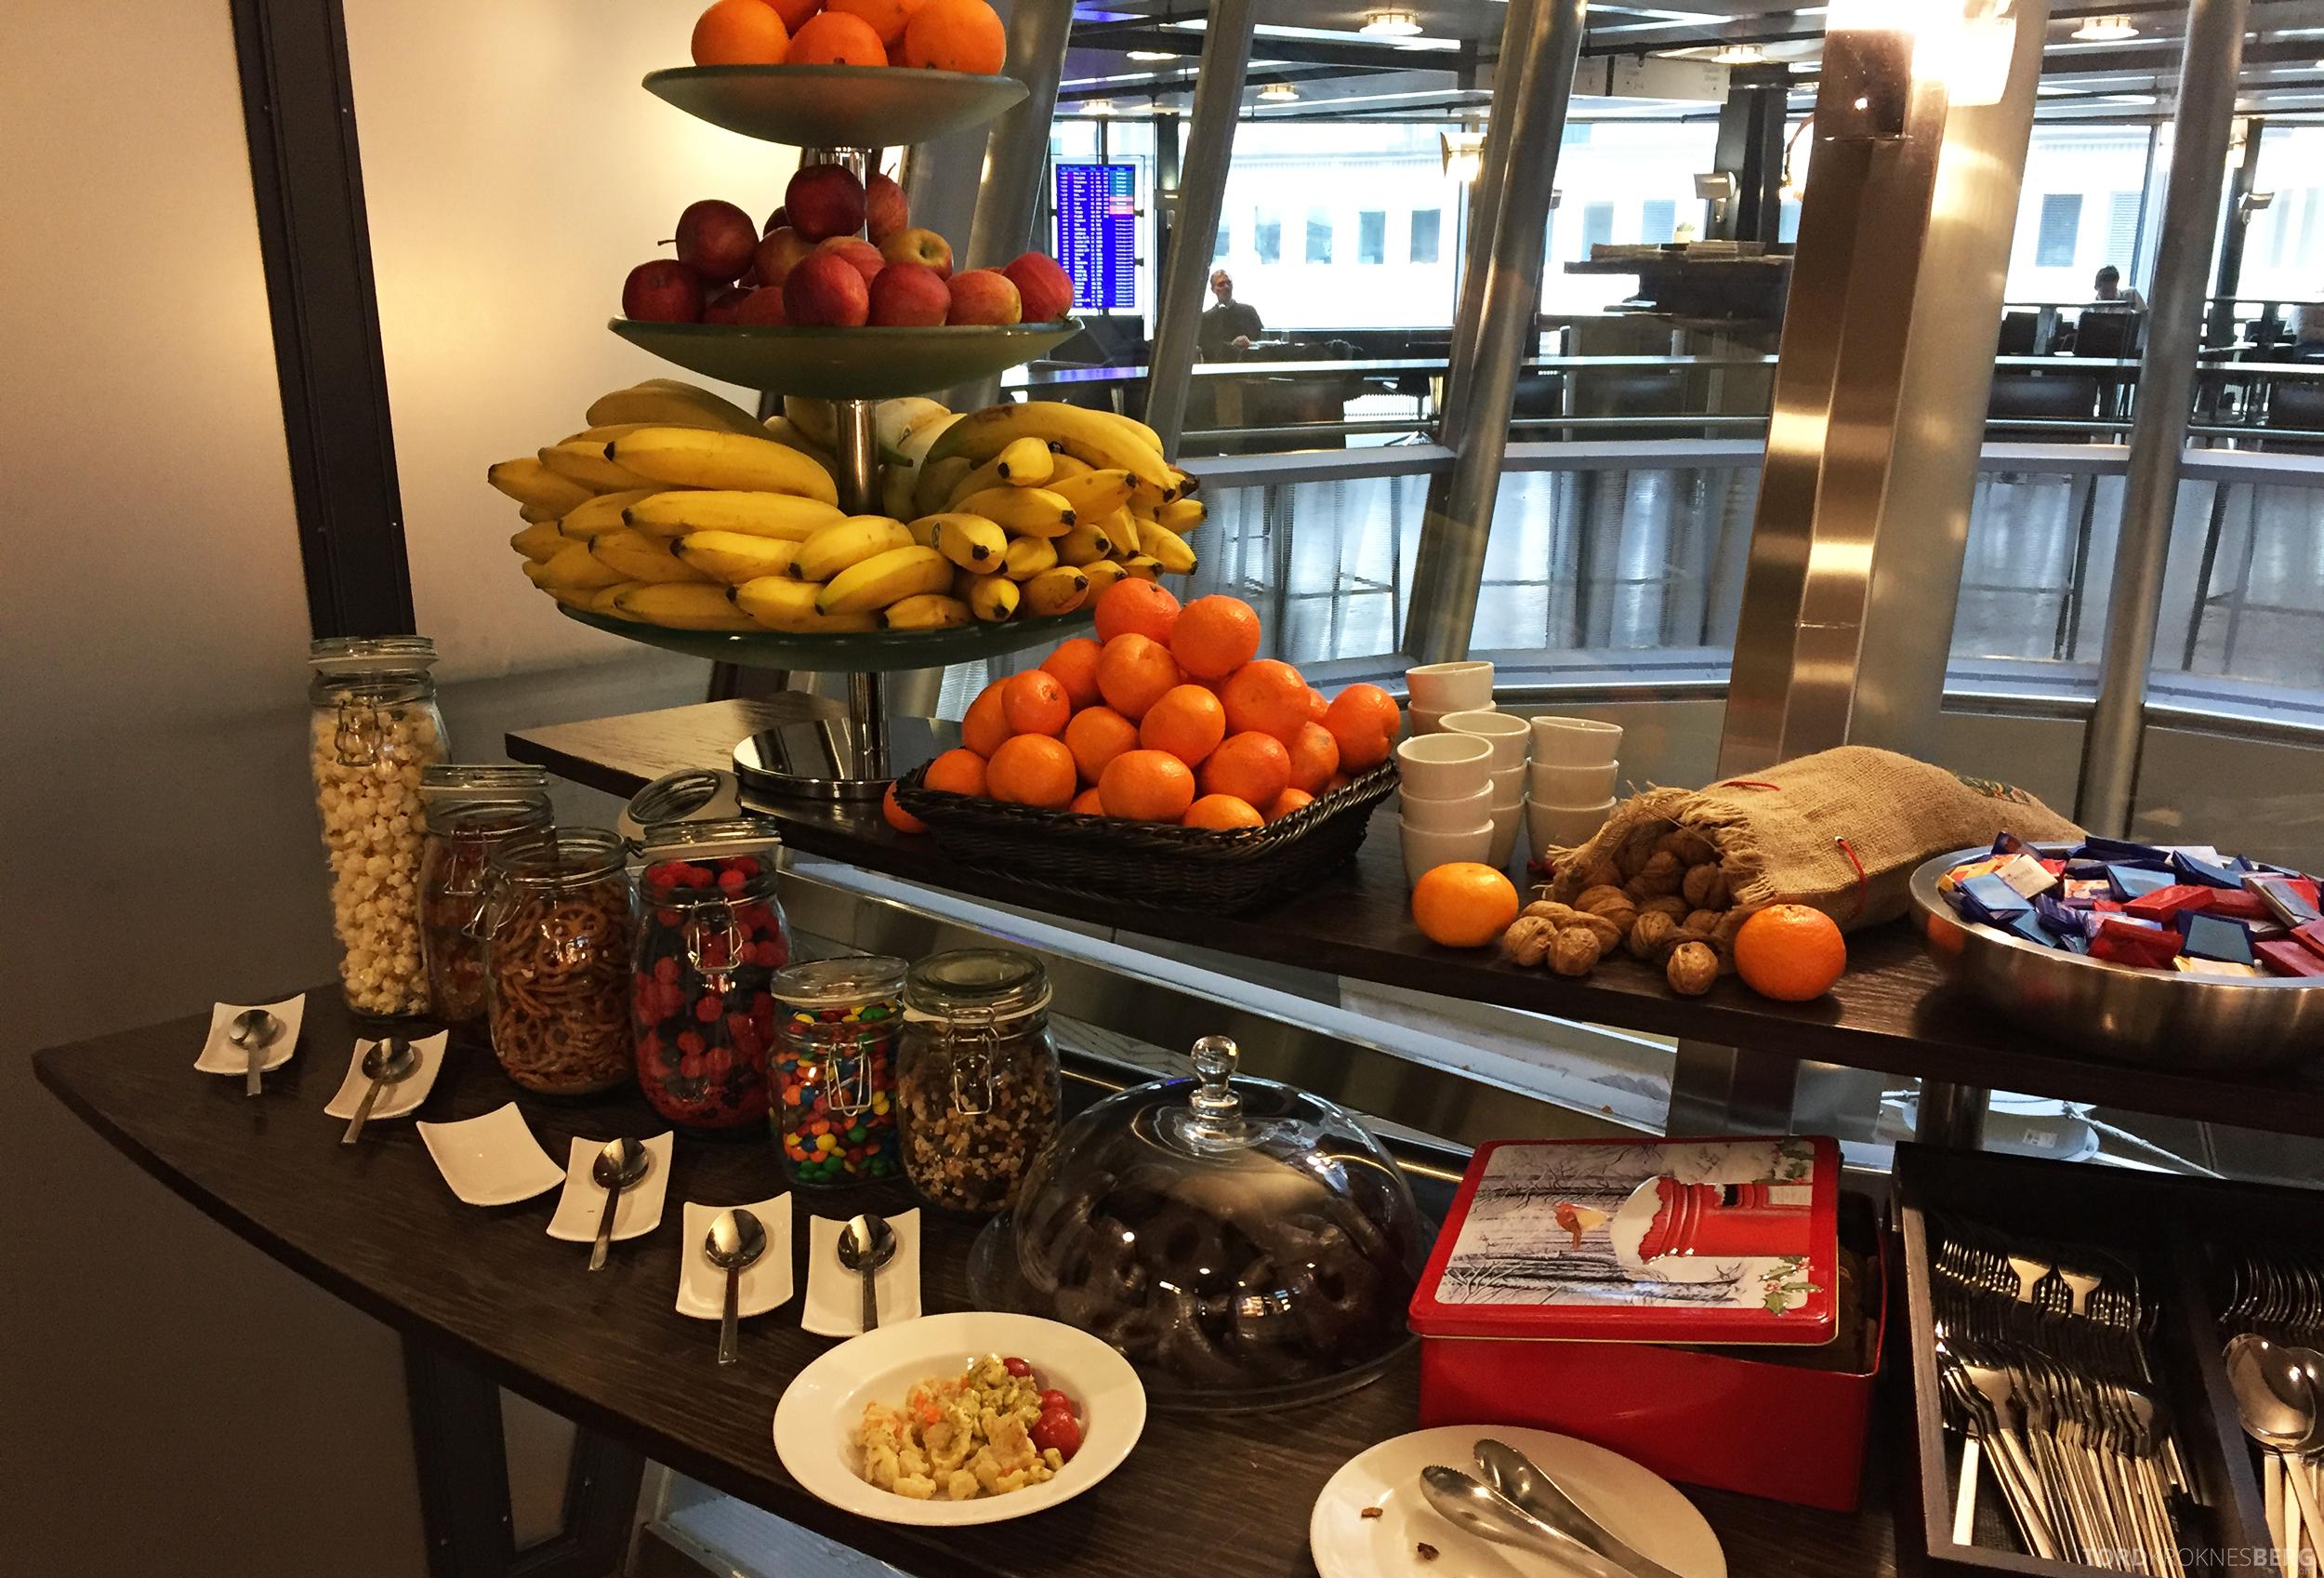 Swiss Senator Lounge Zurich snacks og frukt